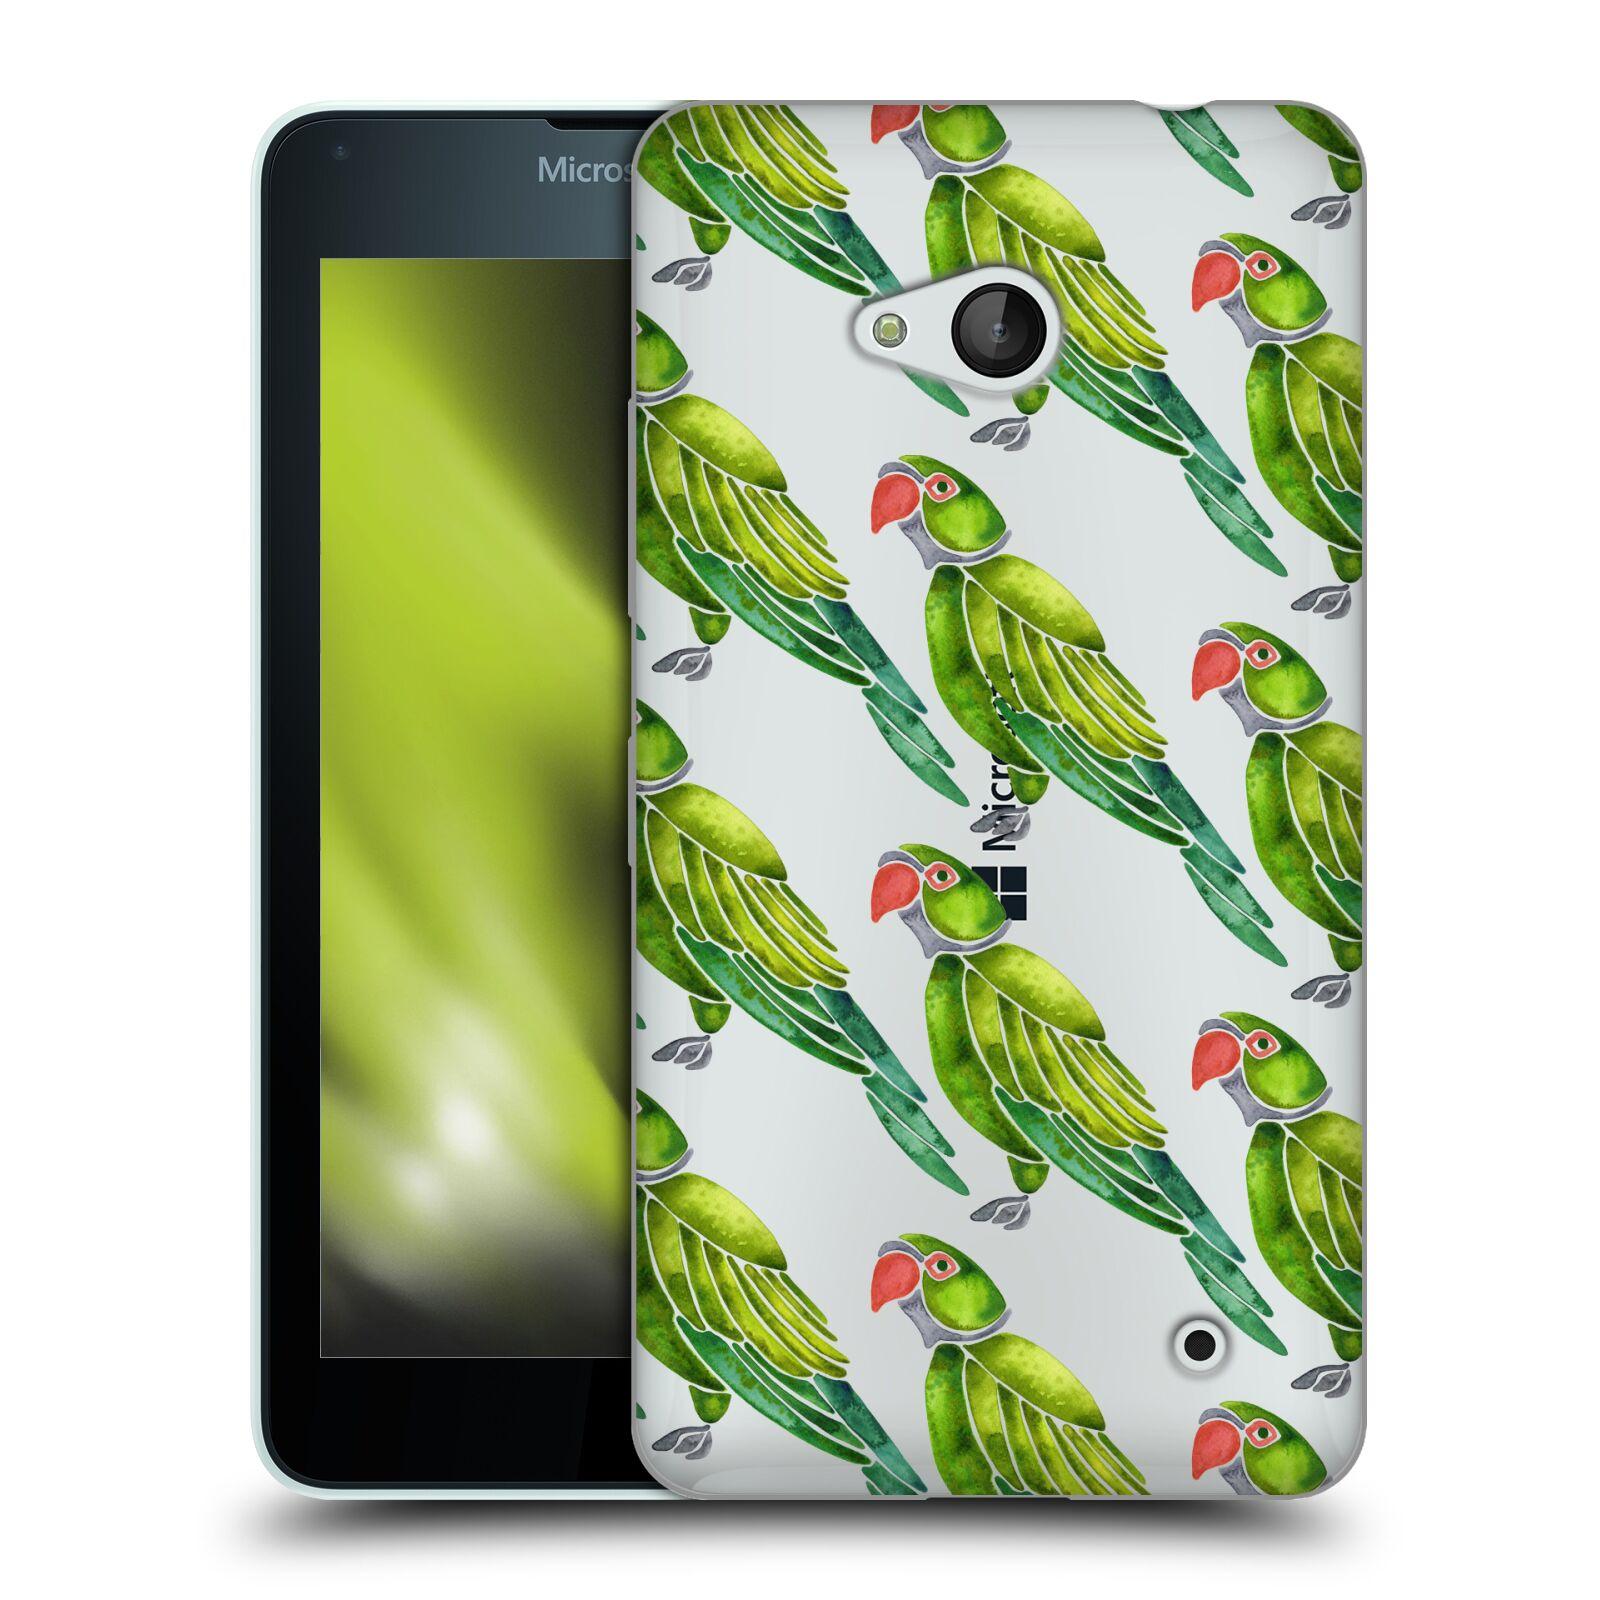 OFFICIAL-CAT-COQUILLETTE-BIRDS-2-SOFT-GEL-CASE-FOR-NOKIA-PHONES-1